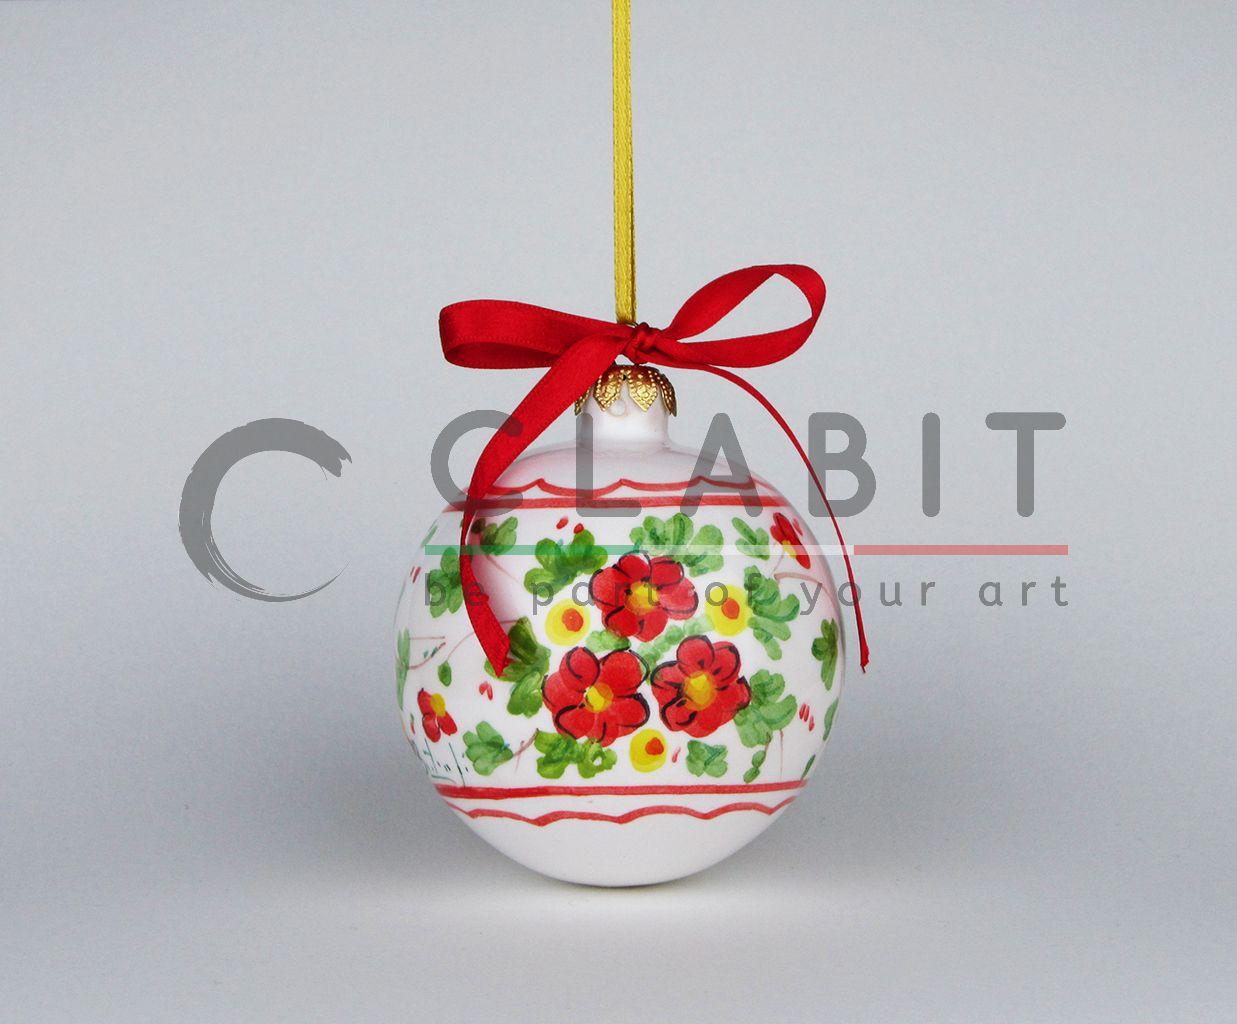 Palline natalizie personalizzate - Italian Christmas Tree